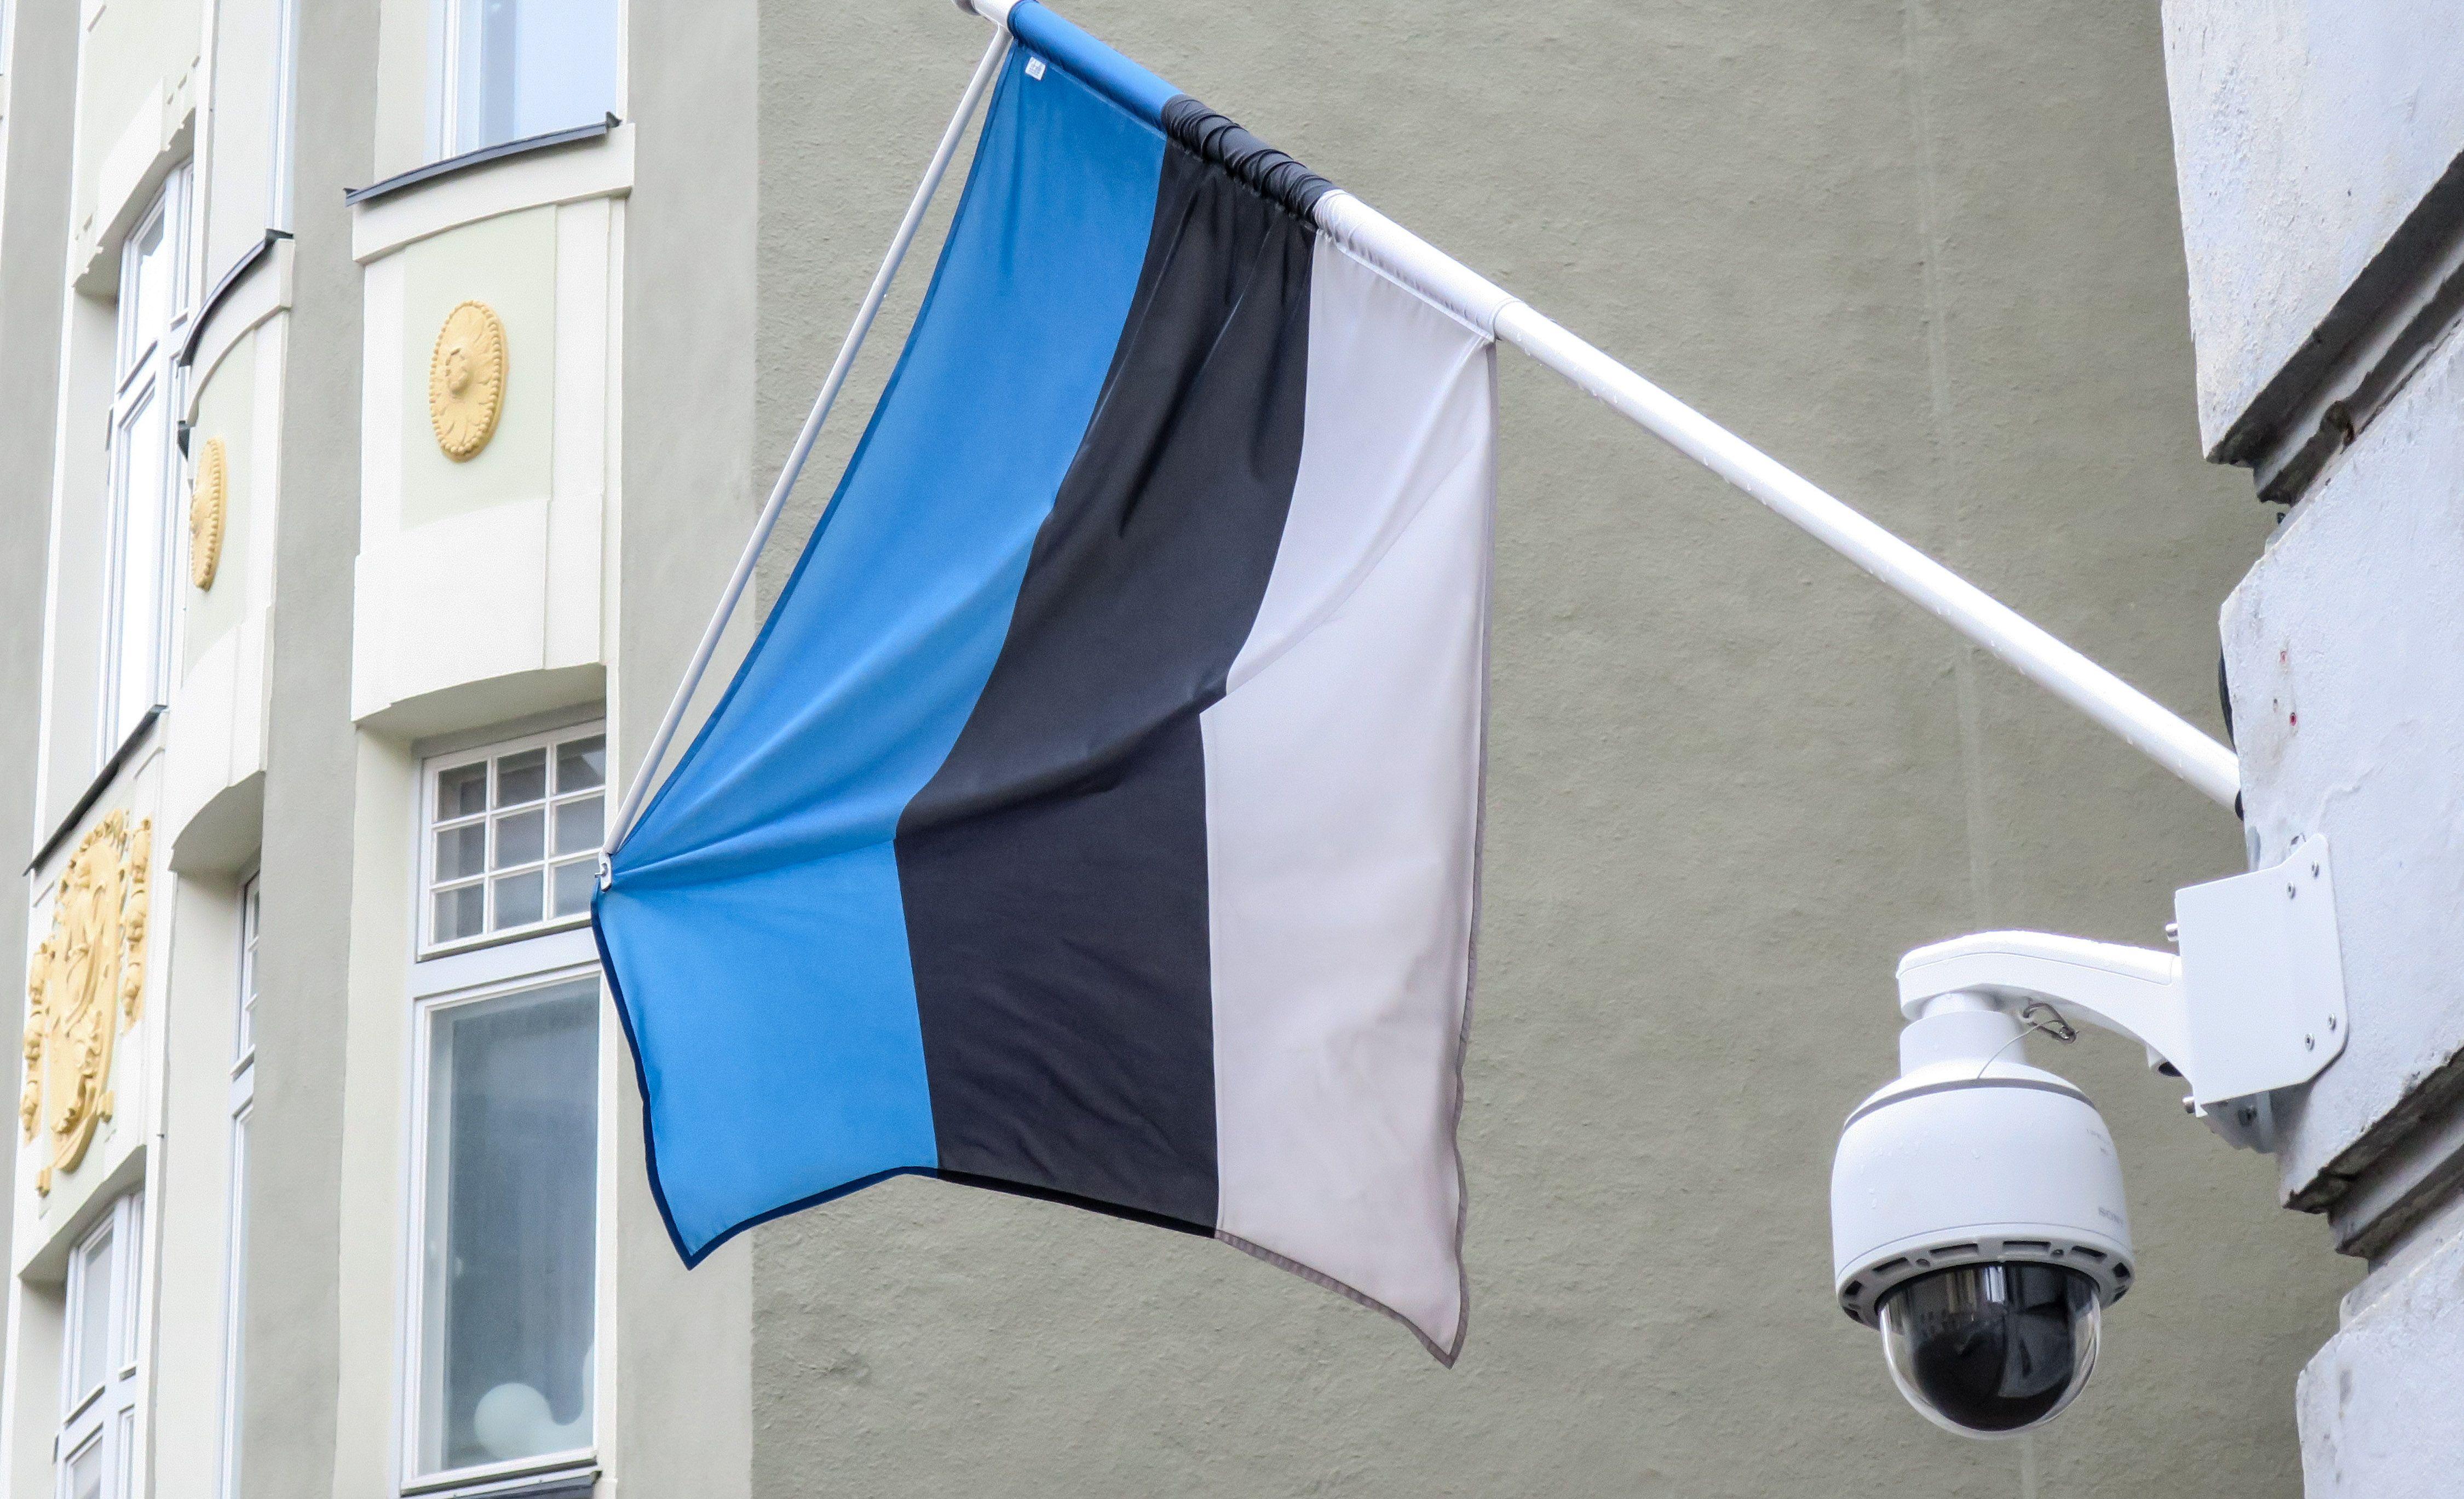 Estija – nebe rojus lietuviškoms investicijoms